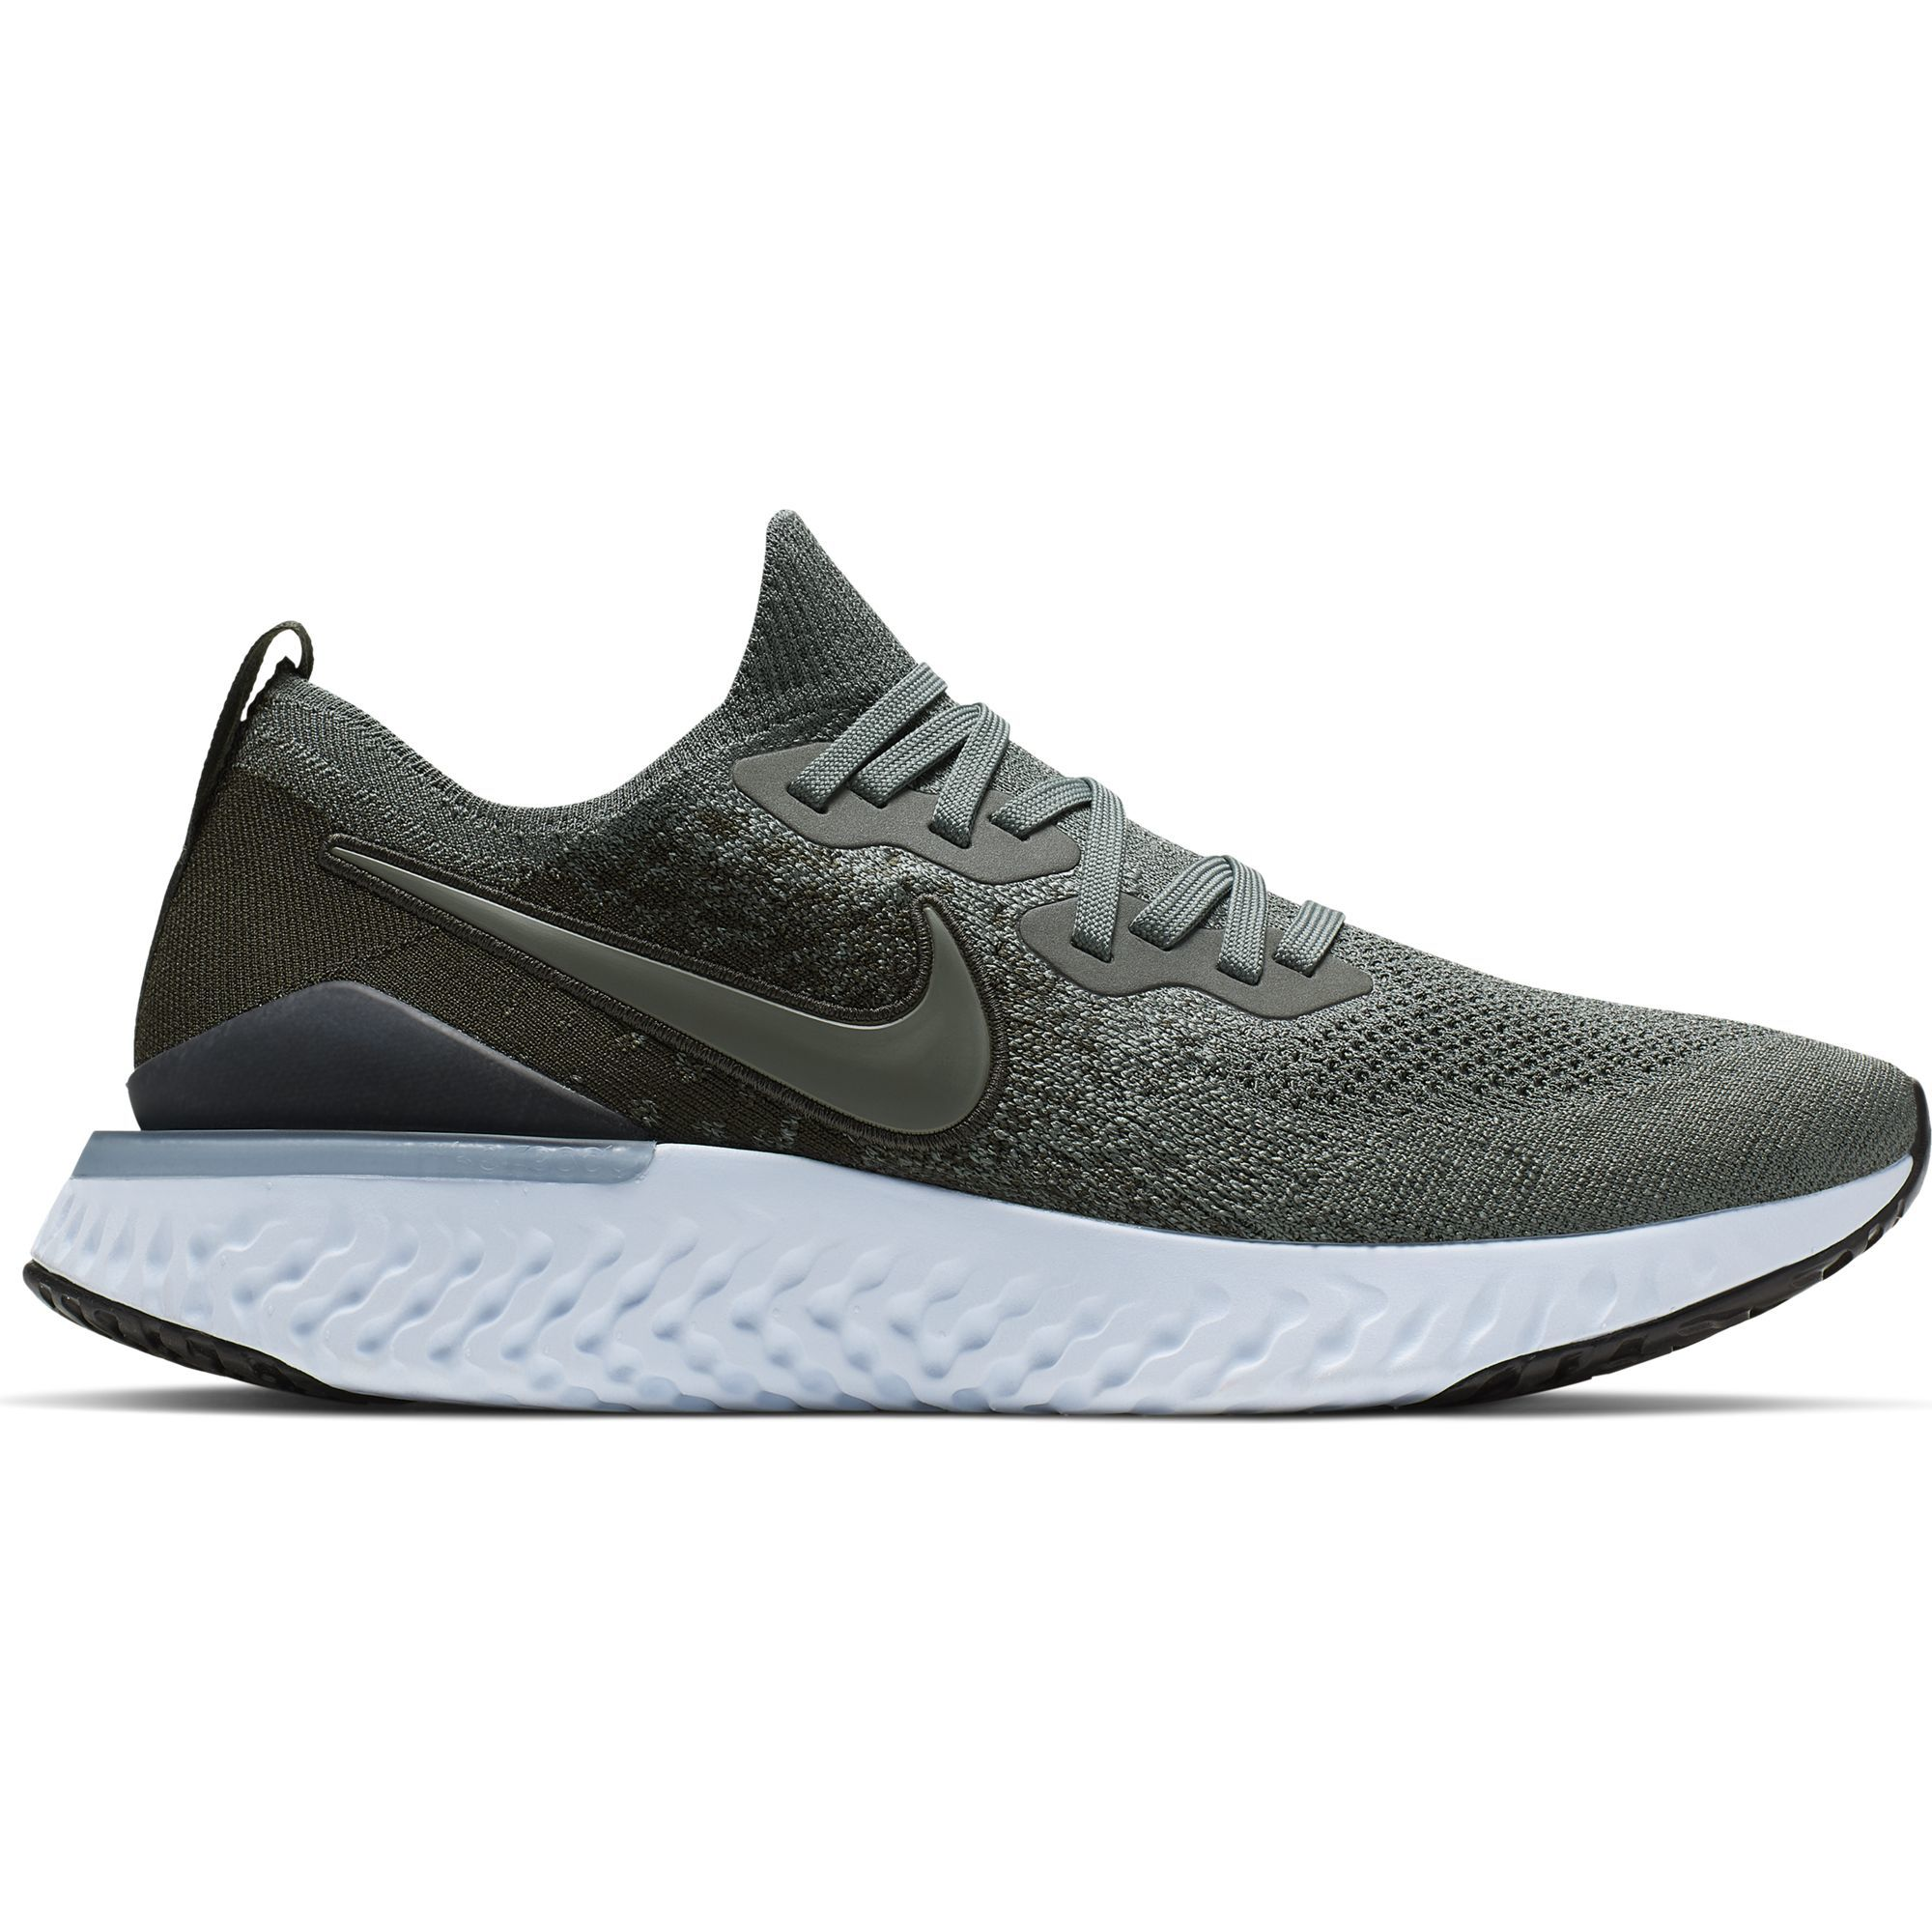 Nike Epic React Flyknit 2 in Oliv